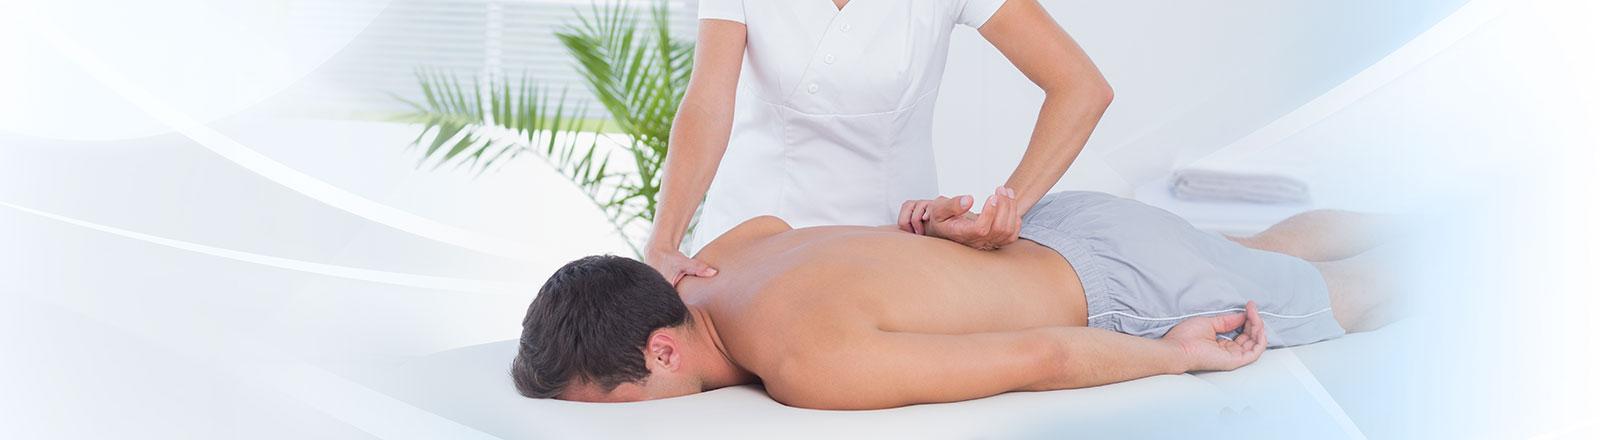 online massage i umeå